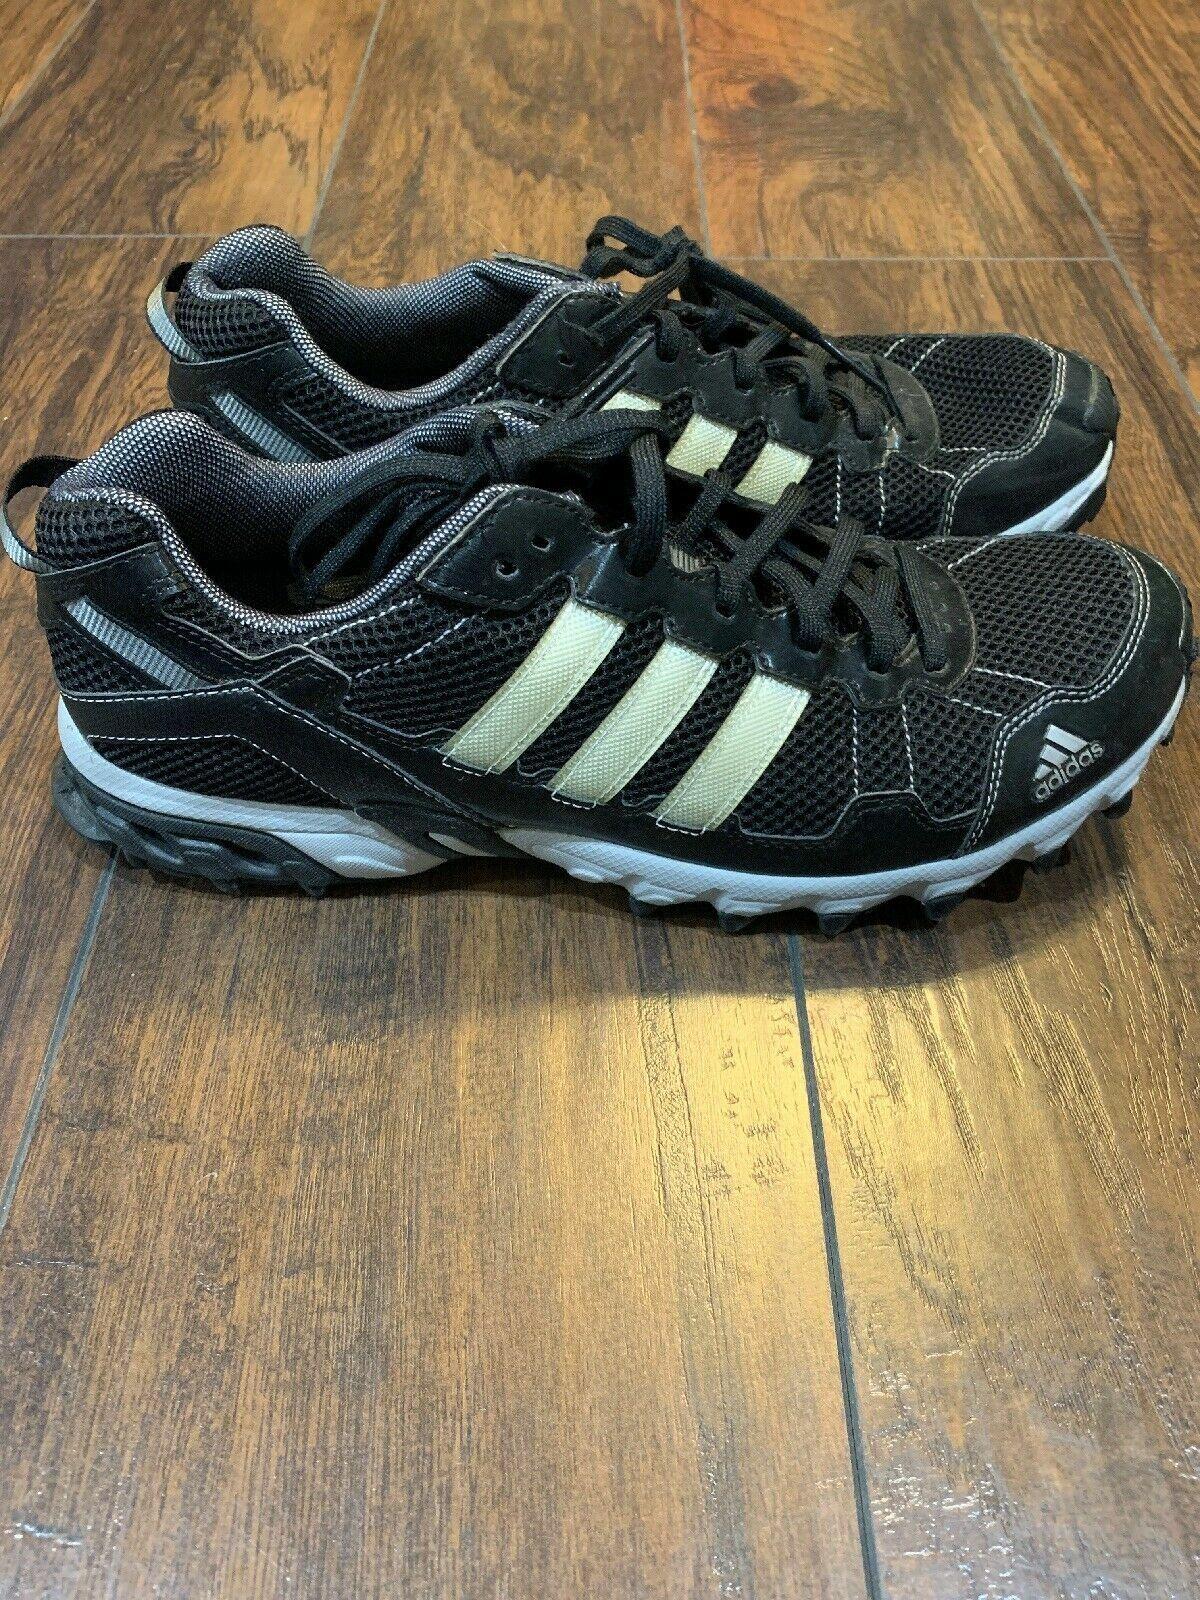 Size 12.5 - adidas Ascent Trail Black